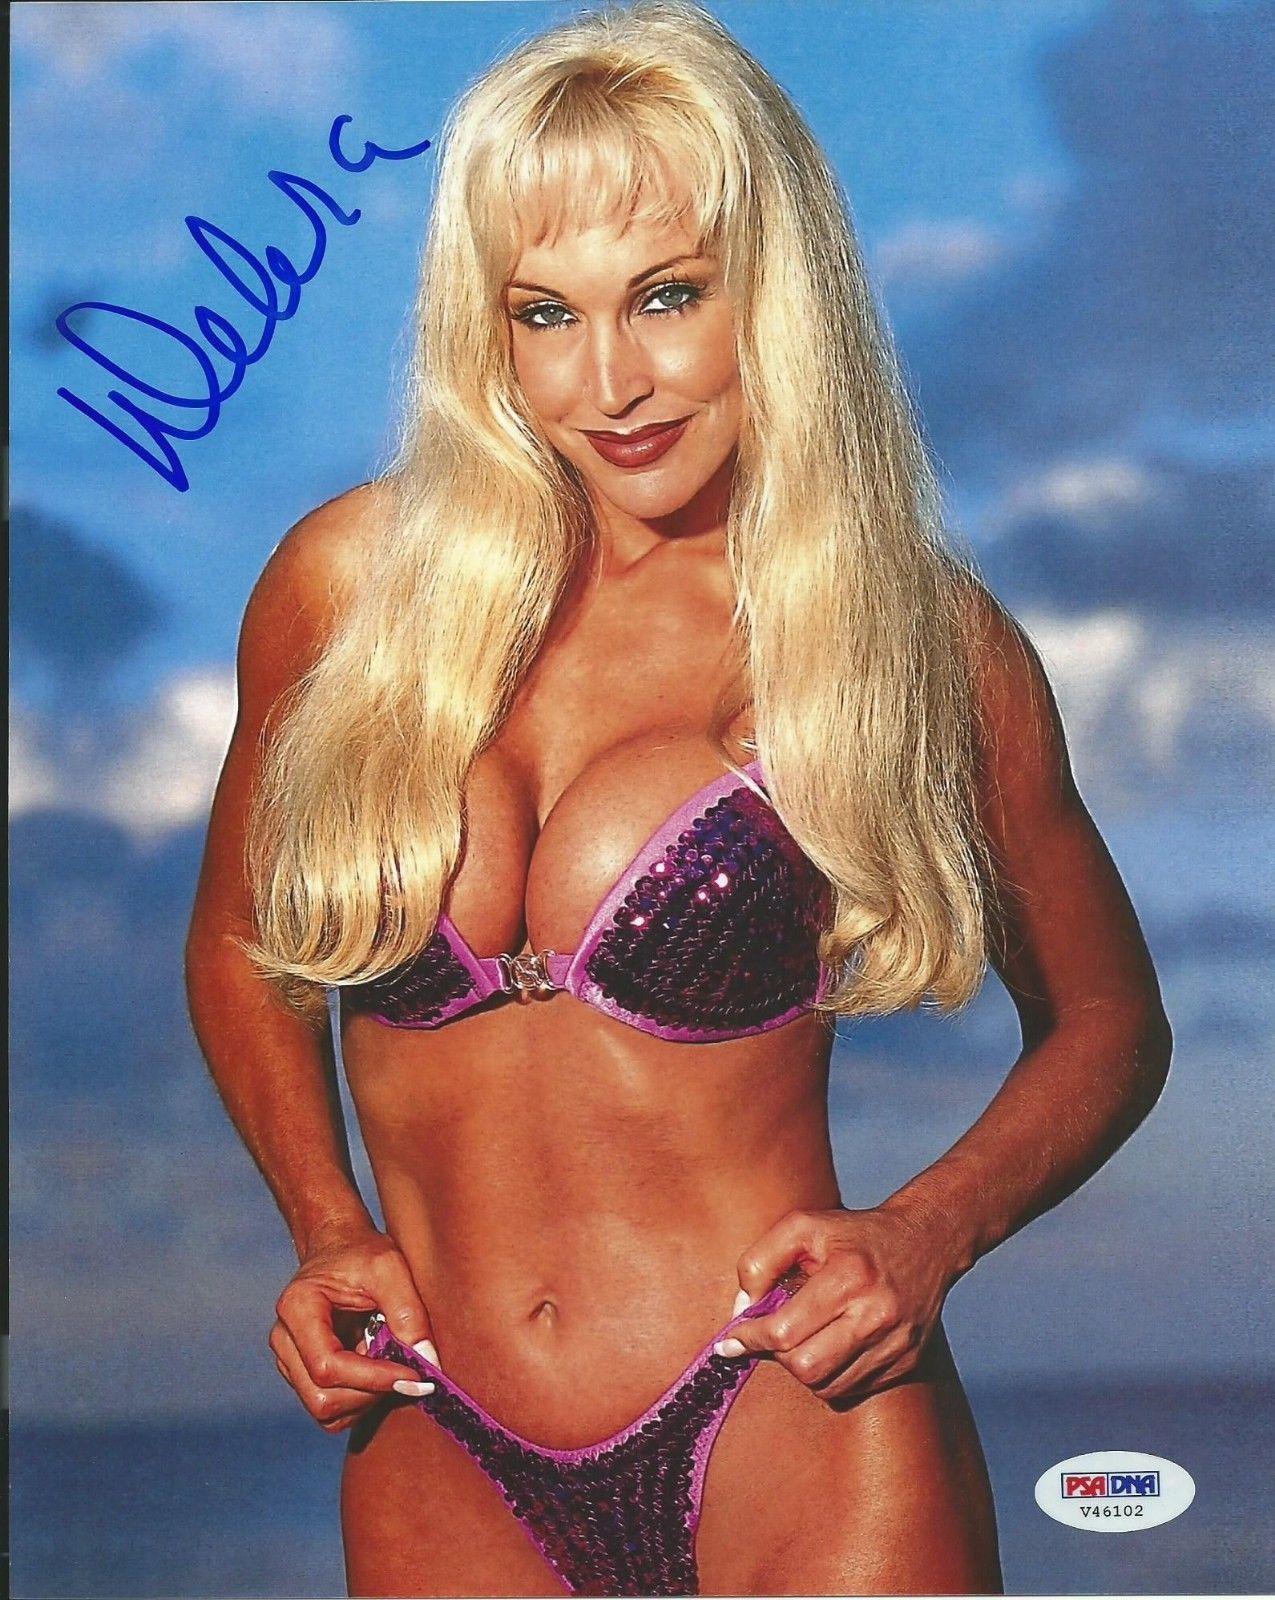 High Quality Autograph - Purple jewled Bikini